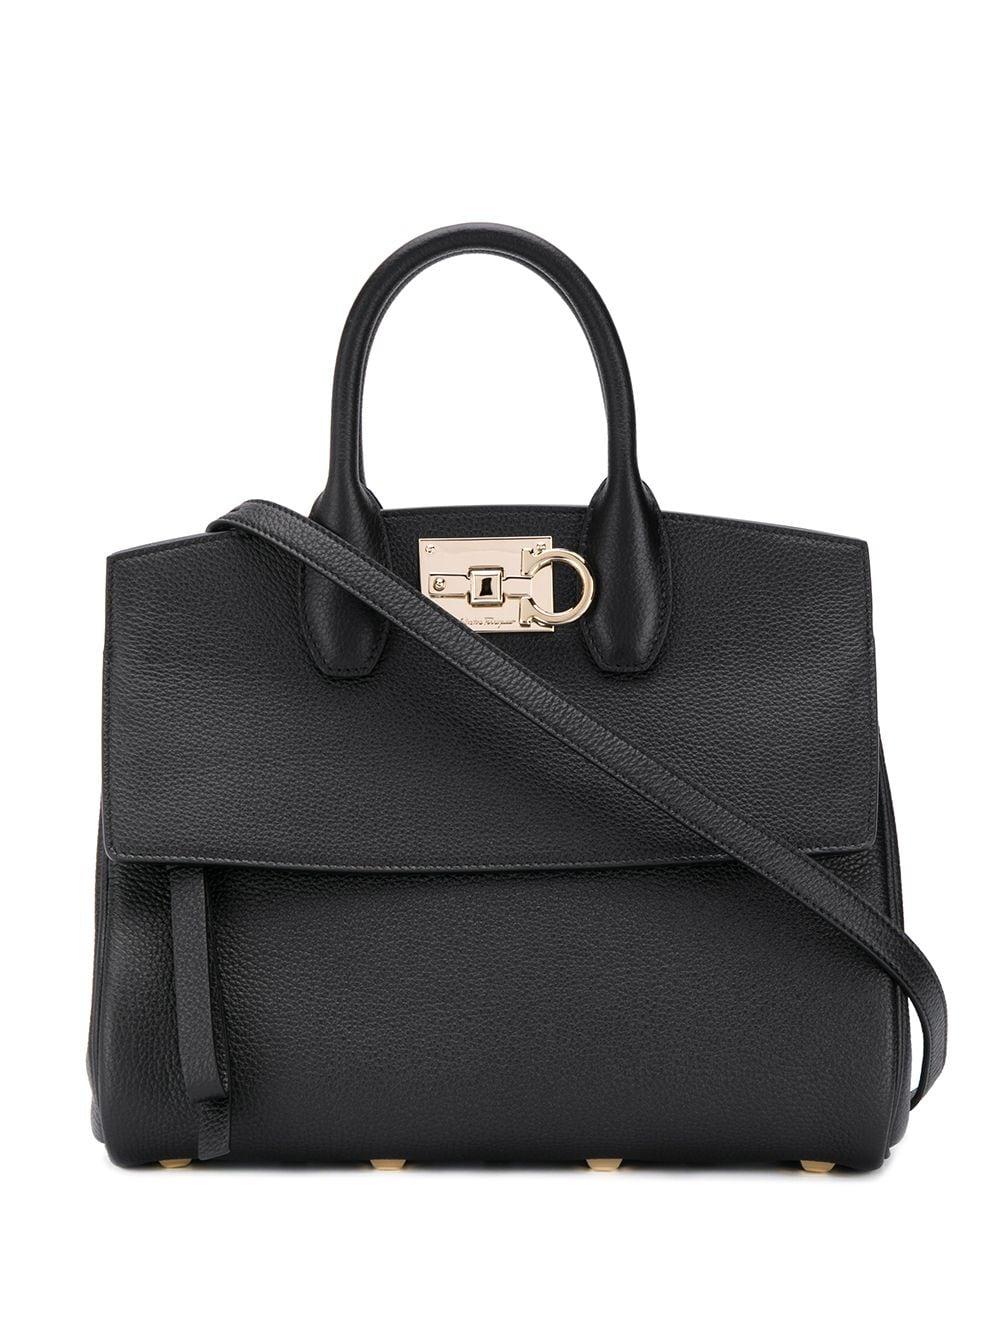 The Studio Leather Handbag